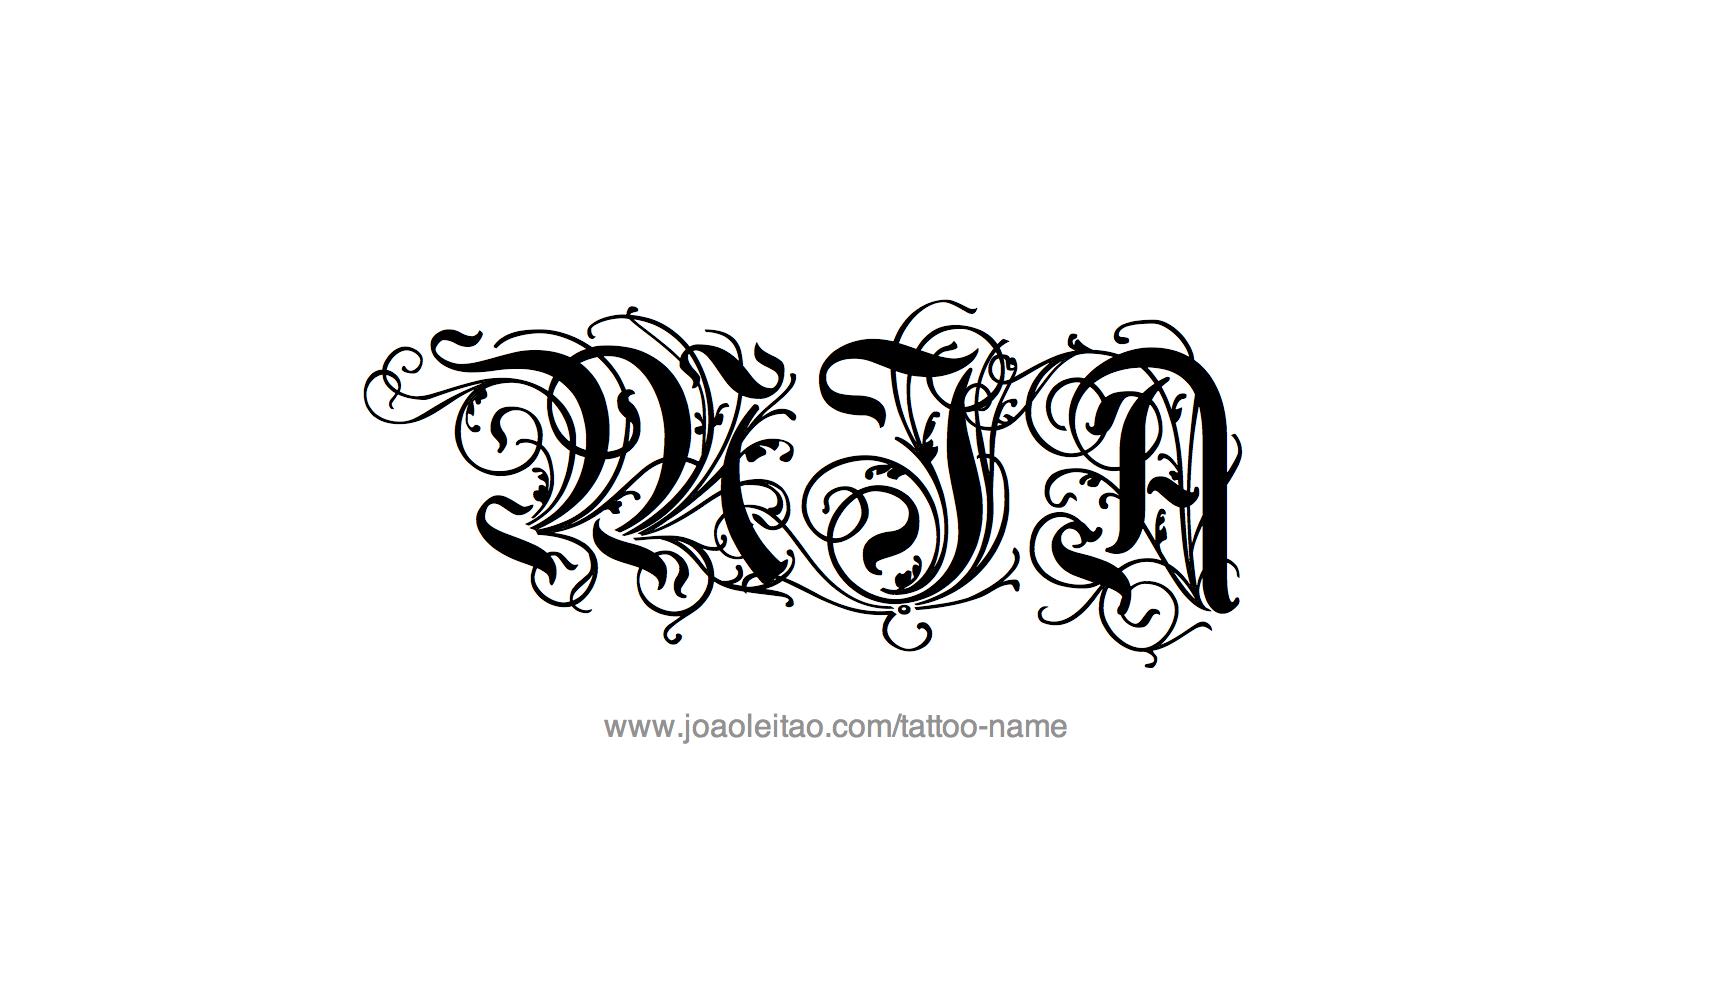 mia name tattoo designs. Black Bedroom Furniture Sets. Home Design Ideas